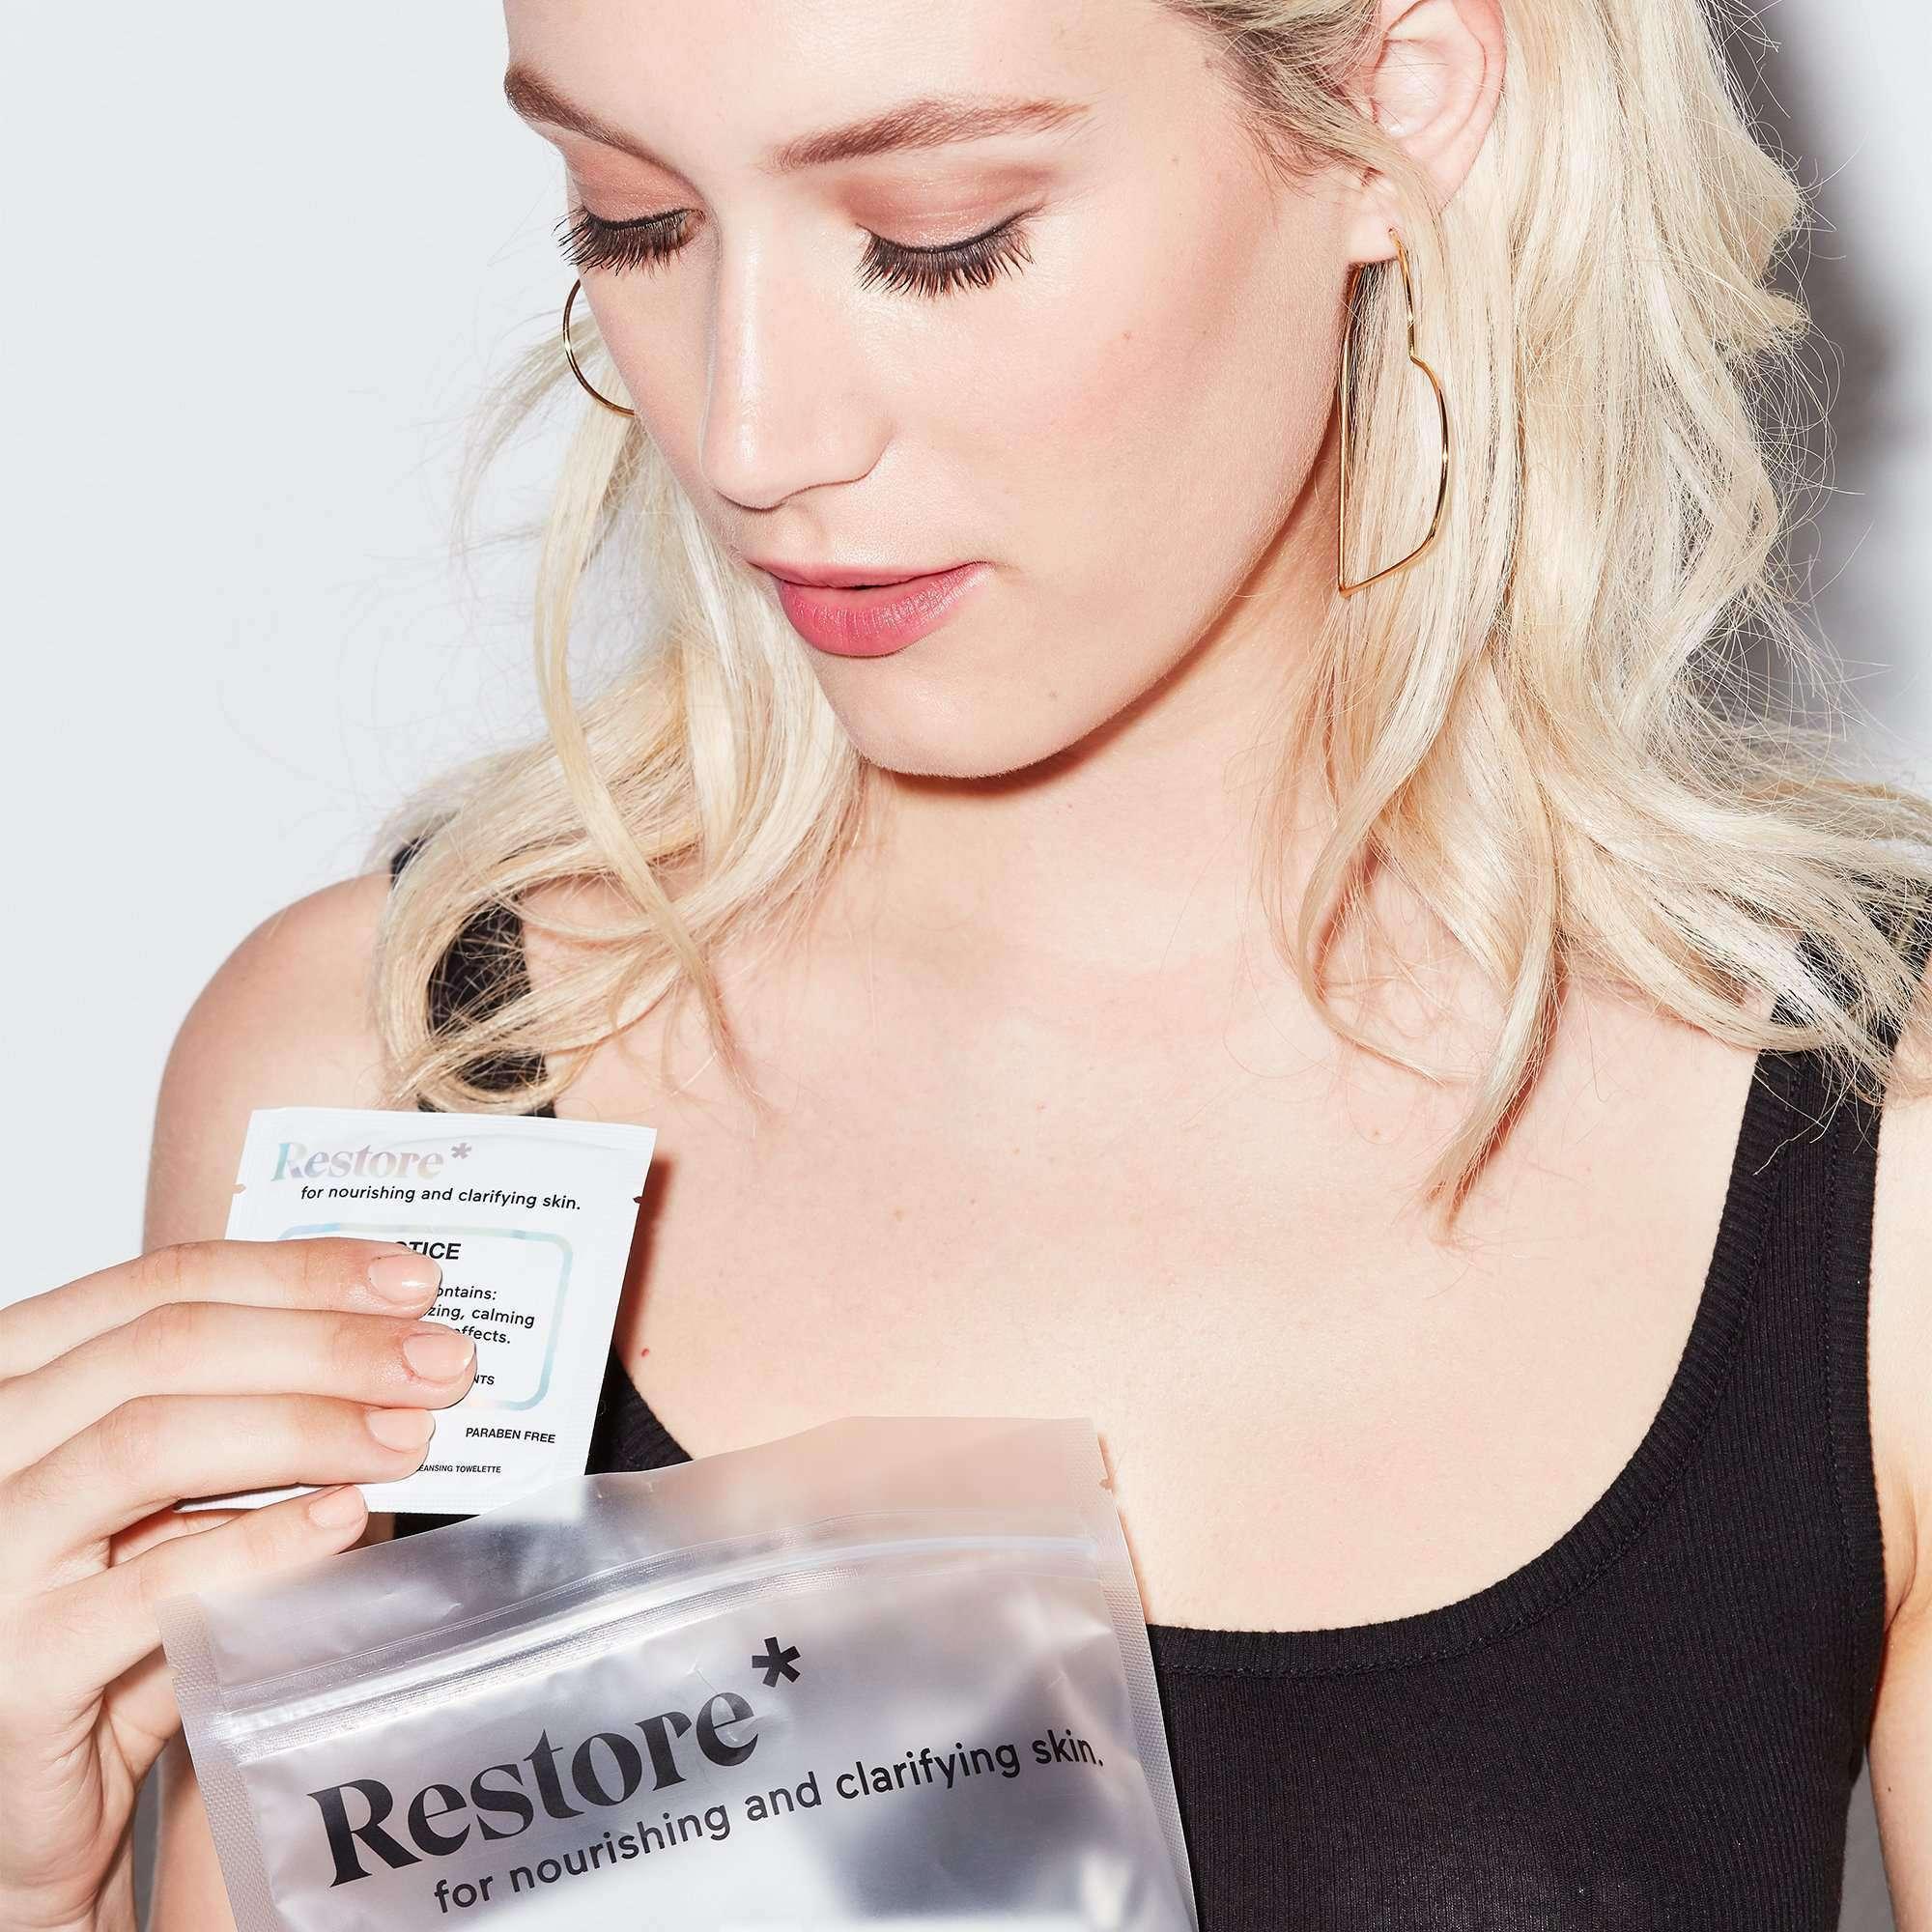 Makeupdrop - Restore Wipes